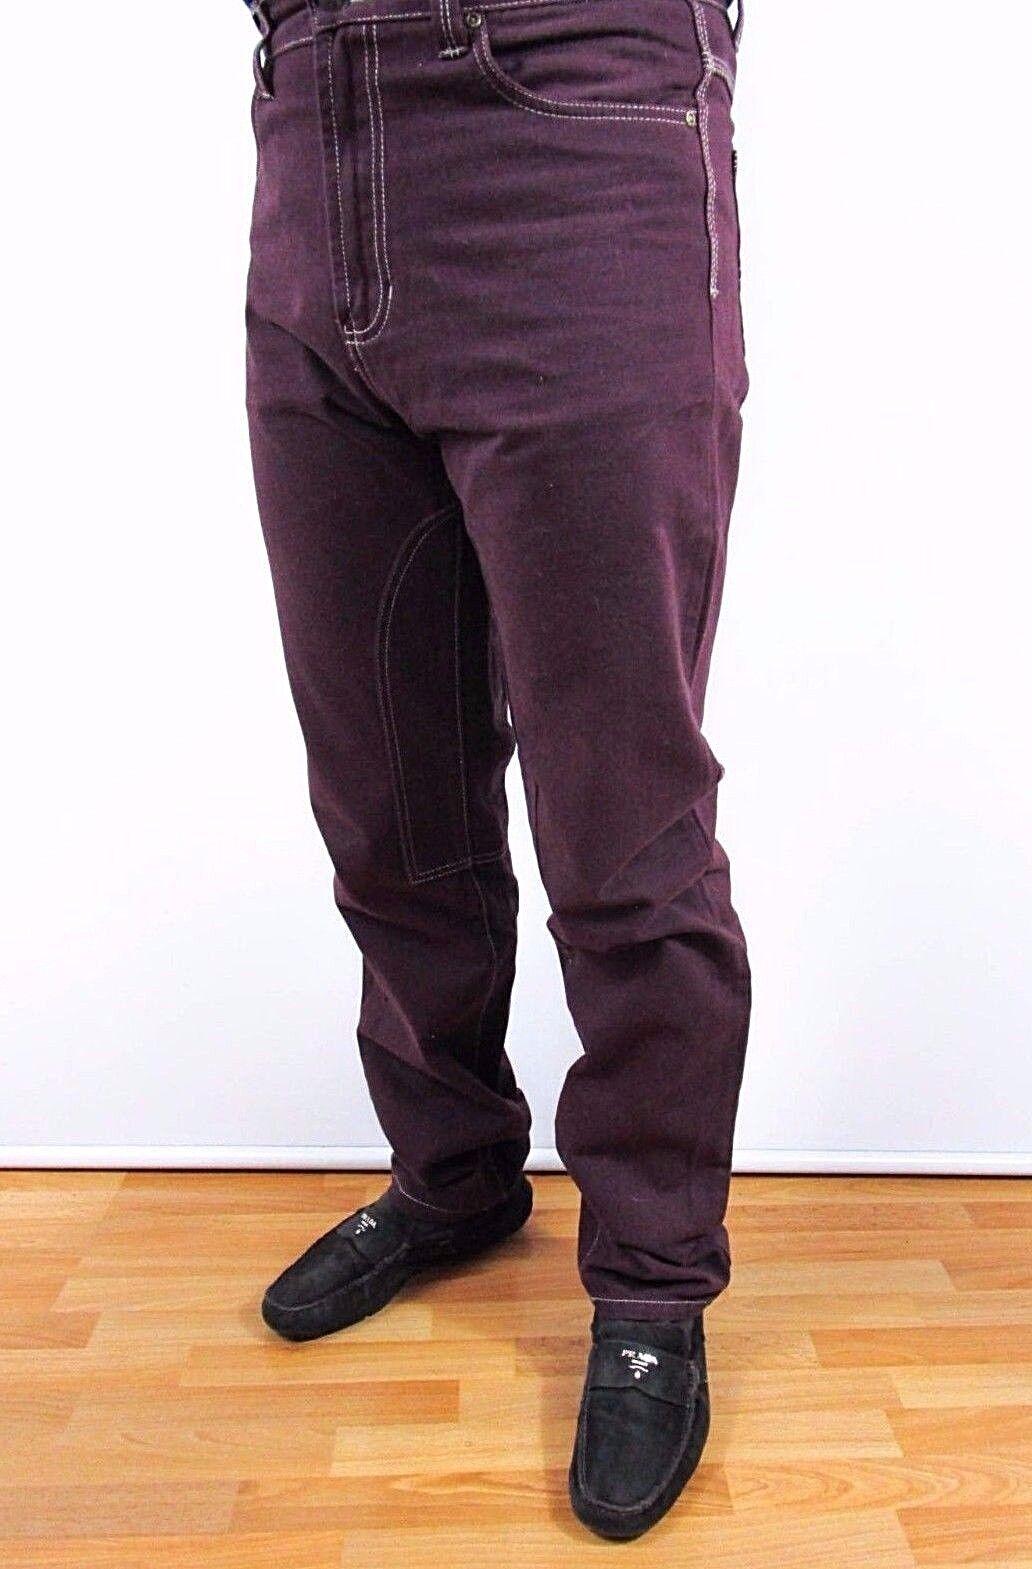 Men's Italian Designer Wine Casual Vtg 90s Cotton Pants Trousers sz W33 BI38